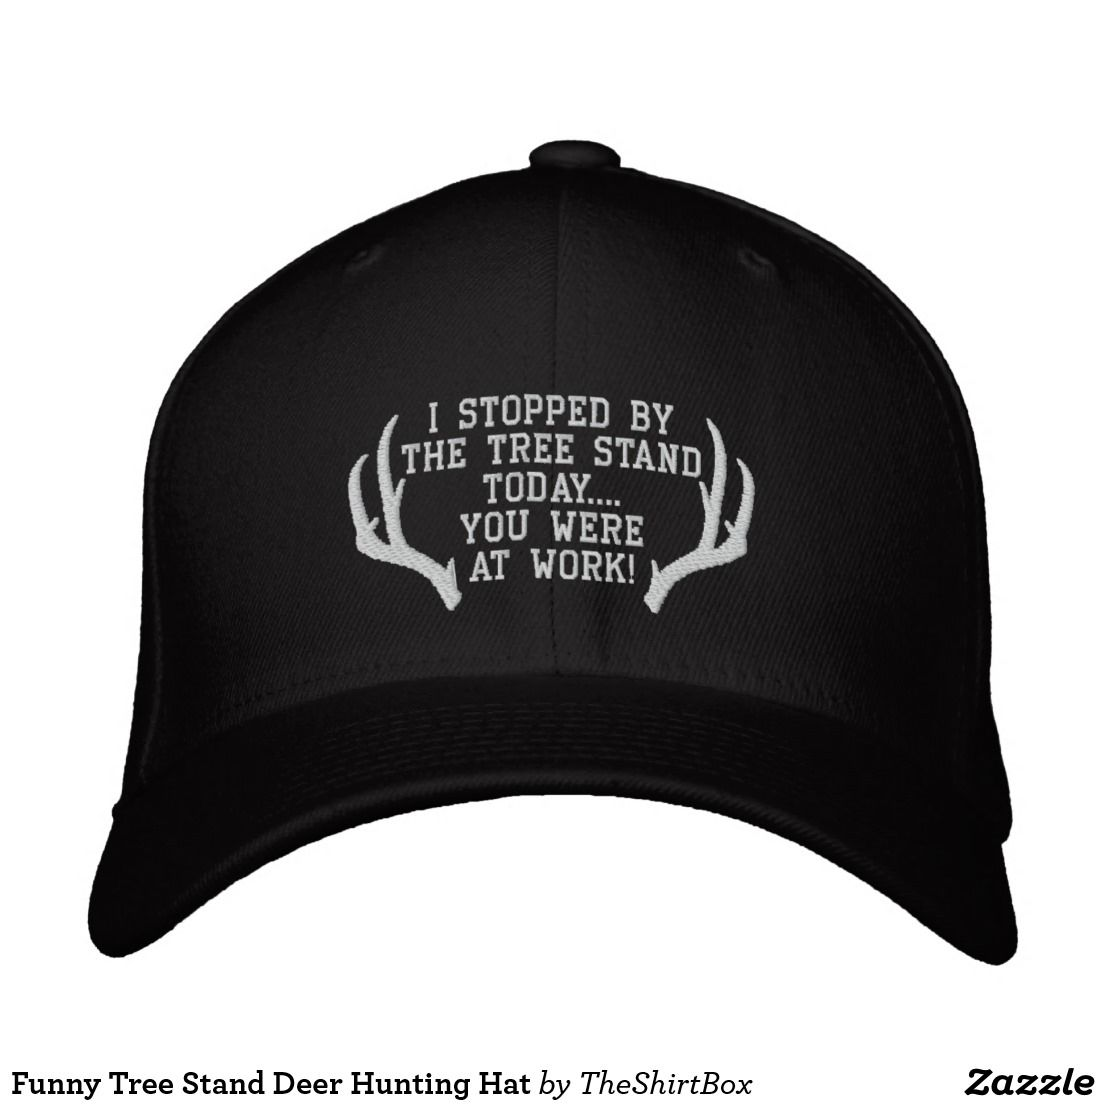 7e0c6cfd Funny Tree Stand Deer Hunting Hat | Zazzle.com | Men's hats | Deer ...